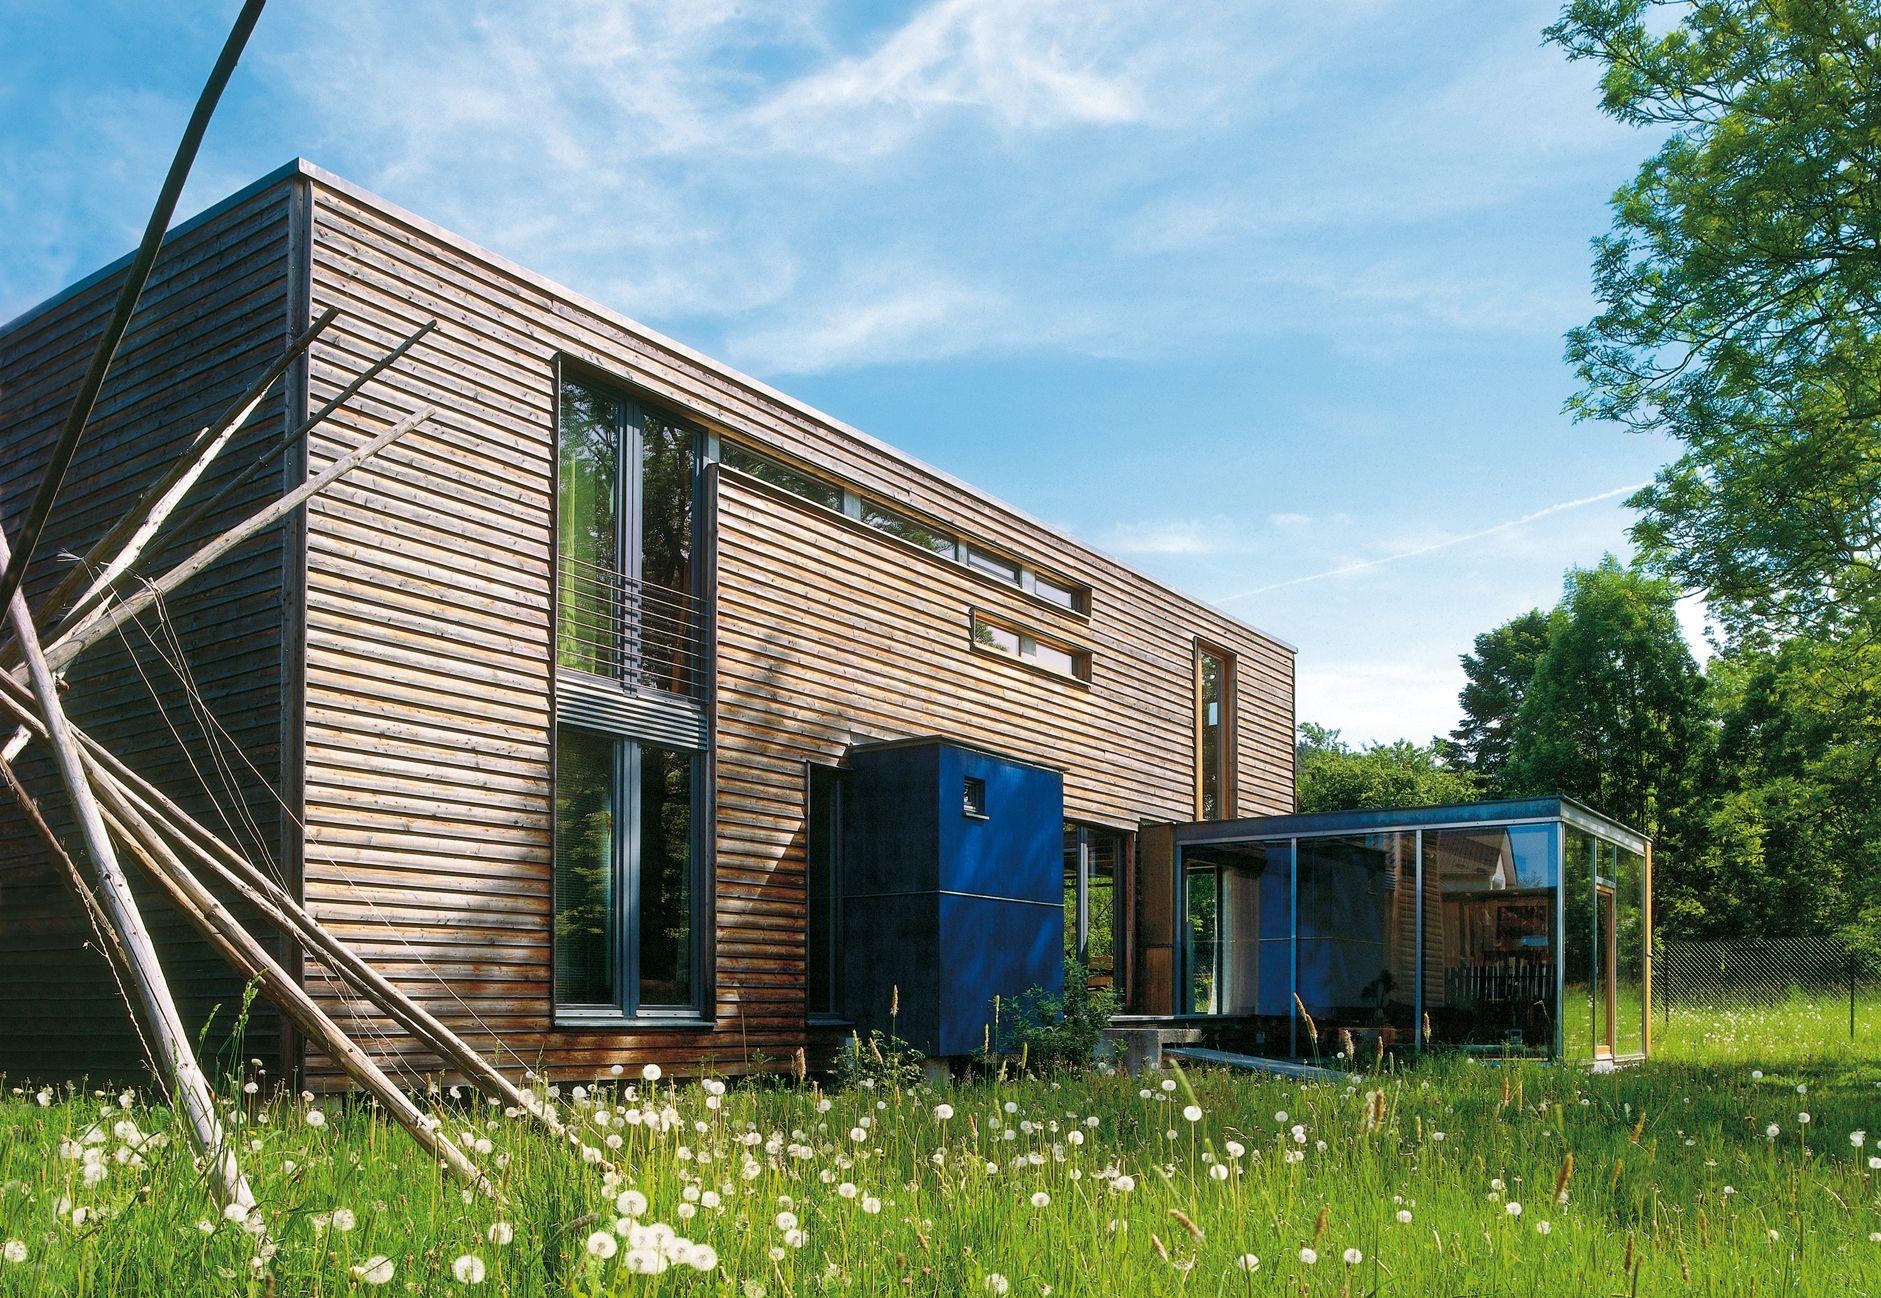 Haus Bauen Bis 100000 Euro Bungalow Haus Bauen Haus Bauen Haus